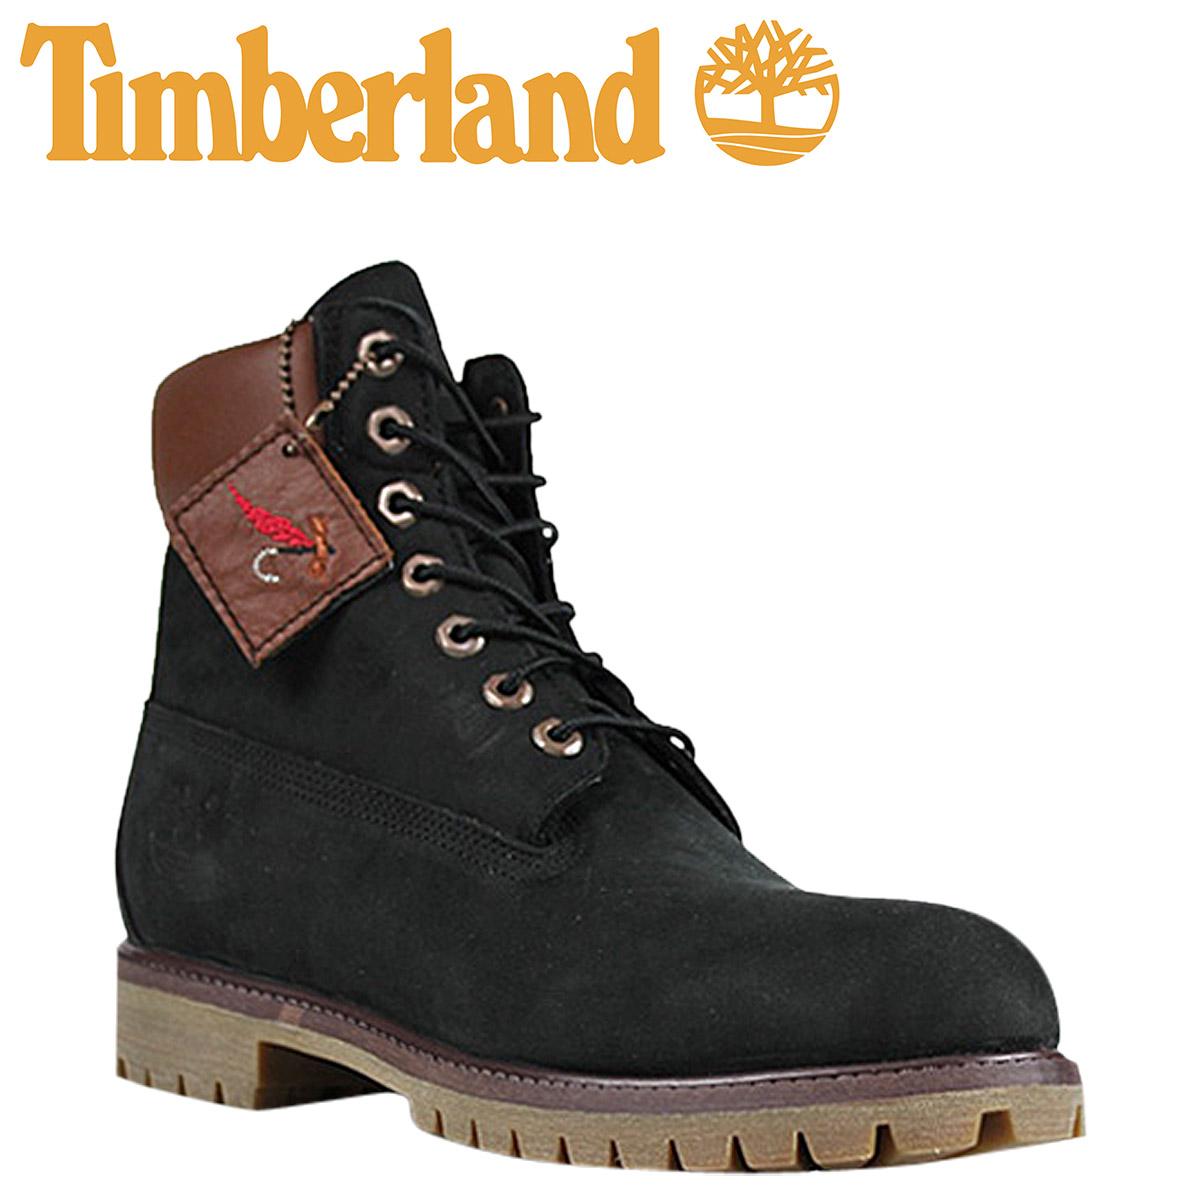 Sugar Online Shop | Rakuten Global Market: [Regular] [SOLD OUT] Timberland  Timberland Heritage Classic 6-inch premium waterproof boot [Black] 6132 R  6inch ...